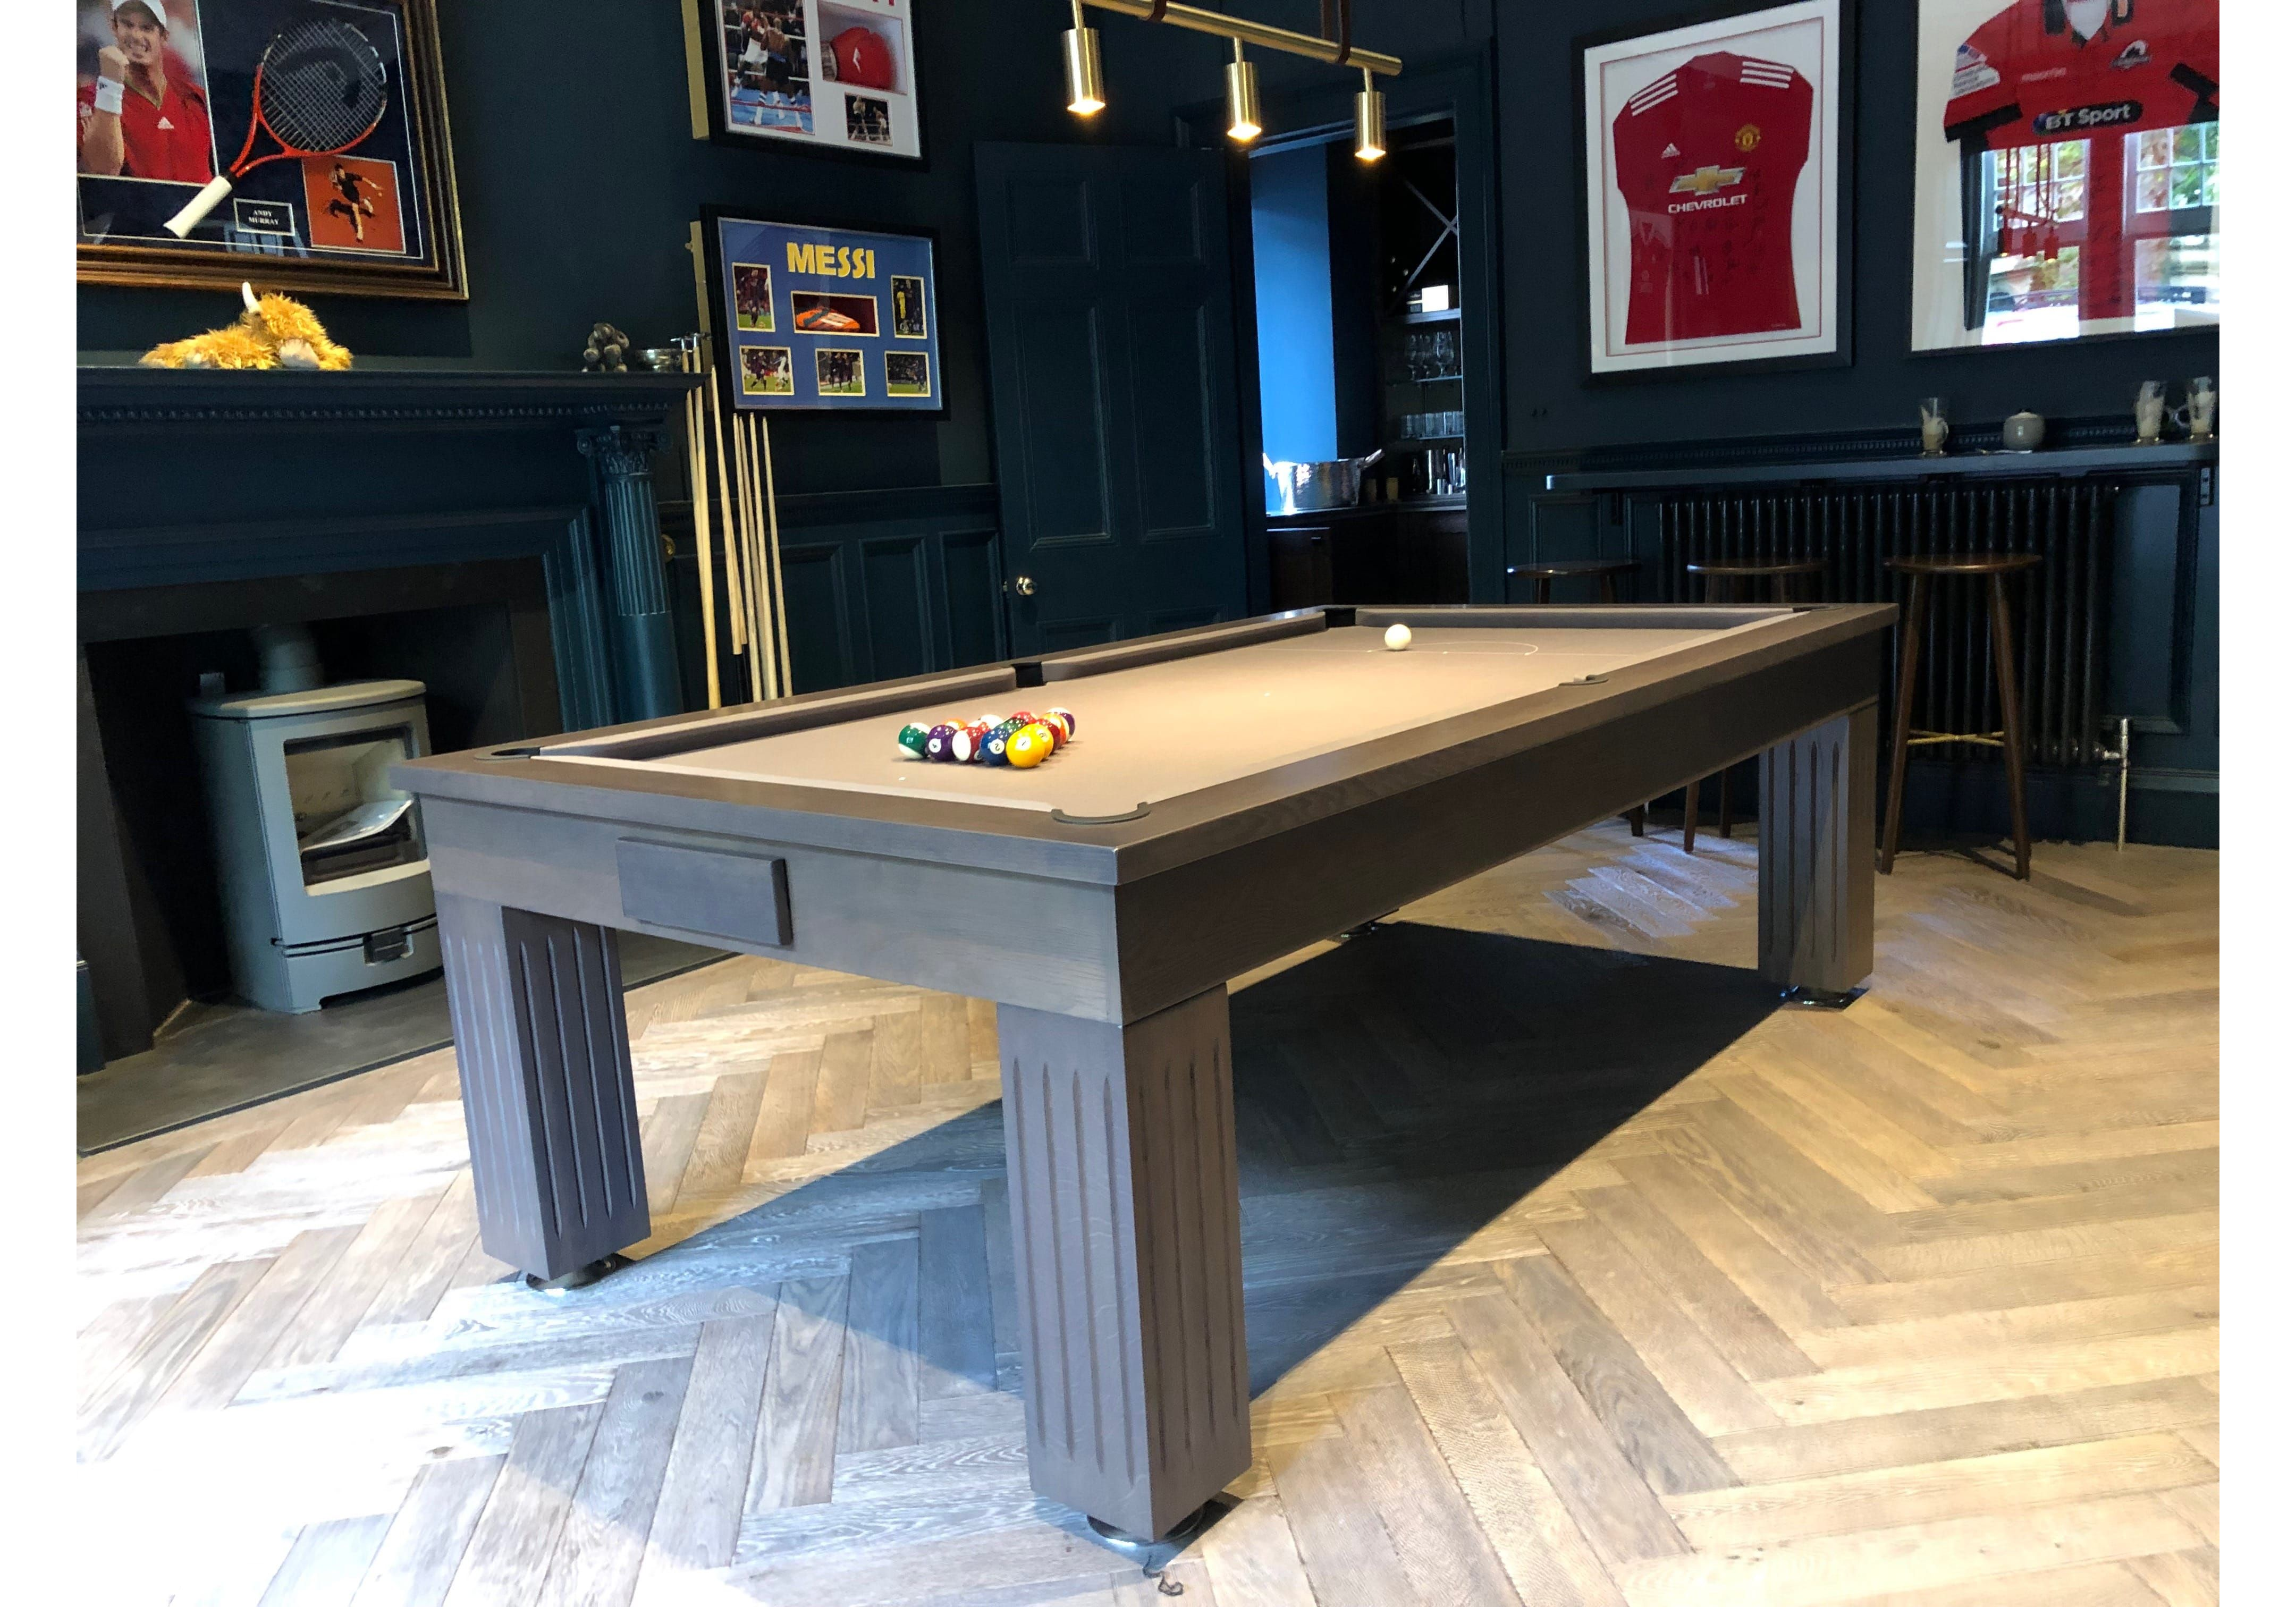 Rex Hardwood Badger Luxury English American Pool Dining Table 8ft Size